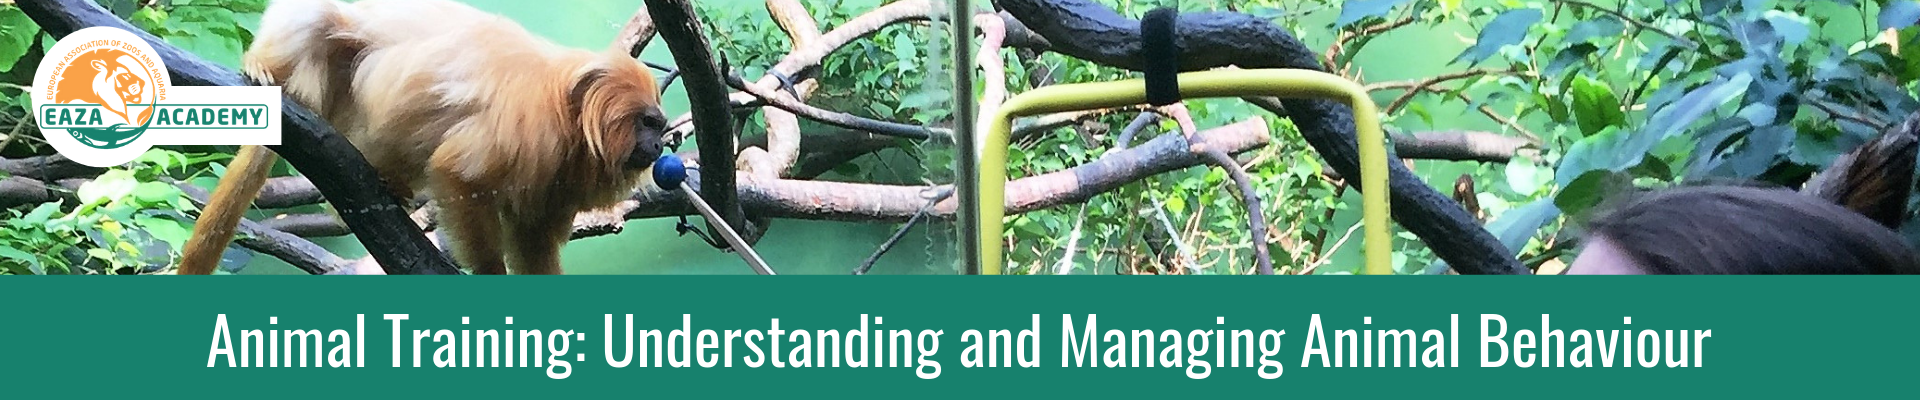 Animal Training: Understanding and Managing Animal Behaviour